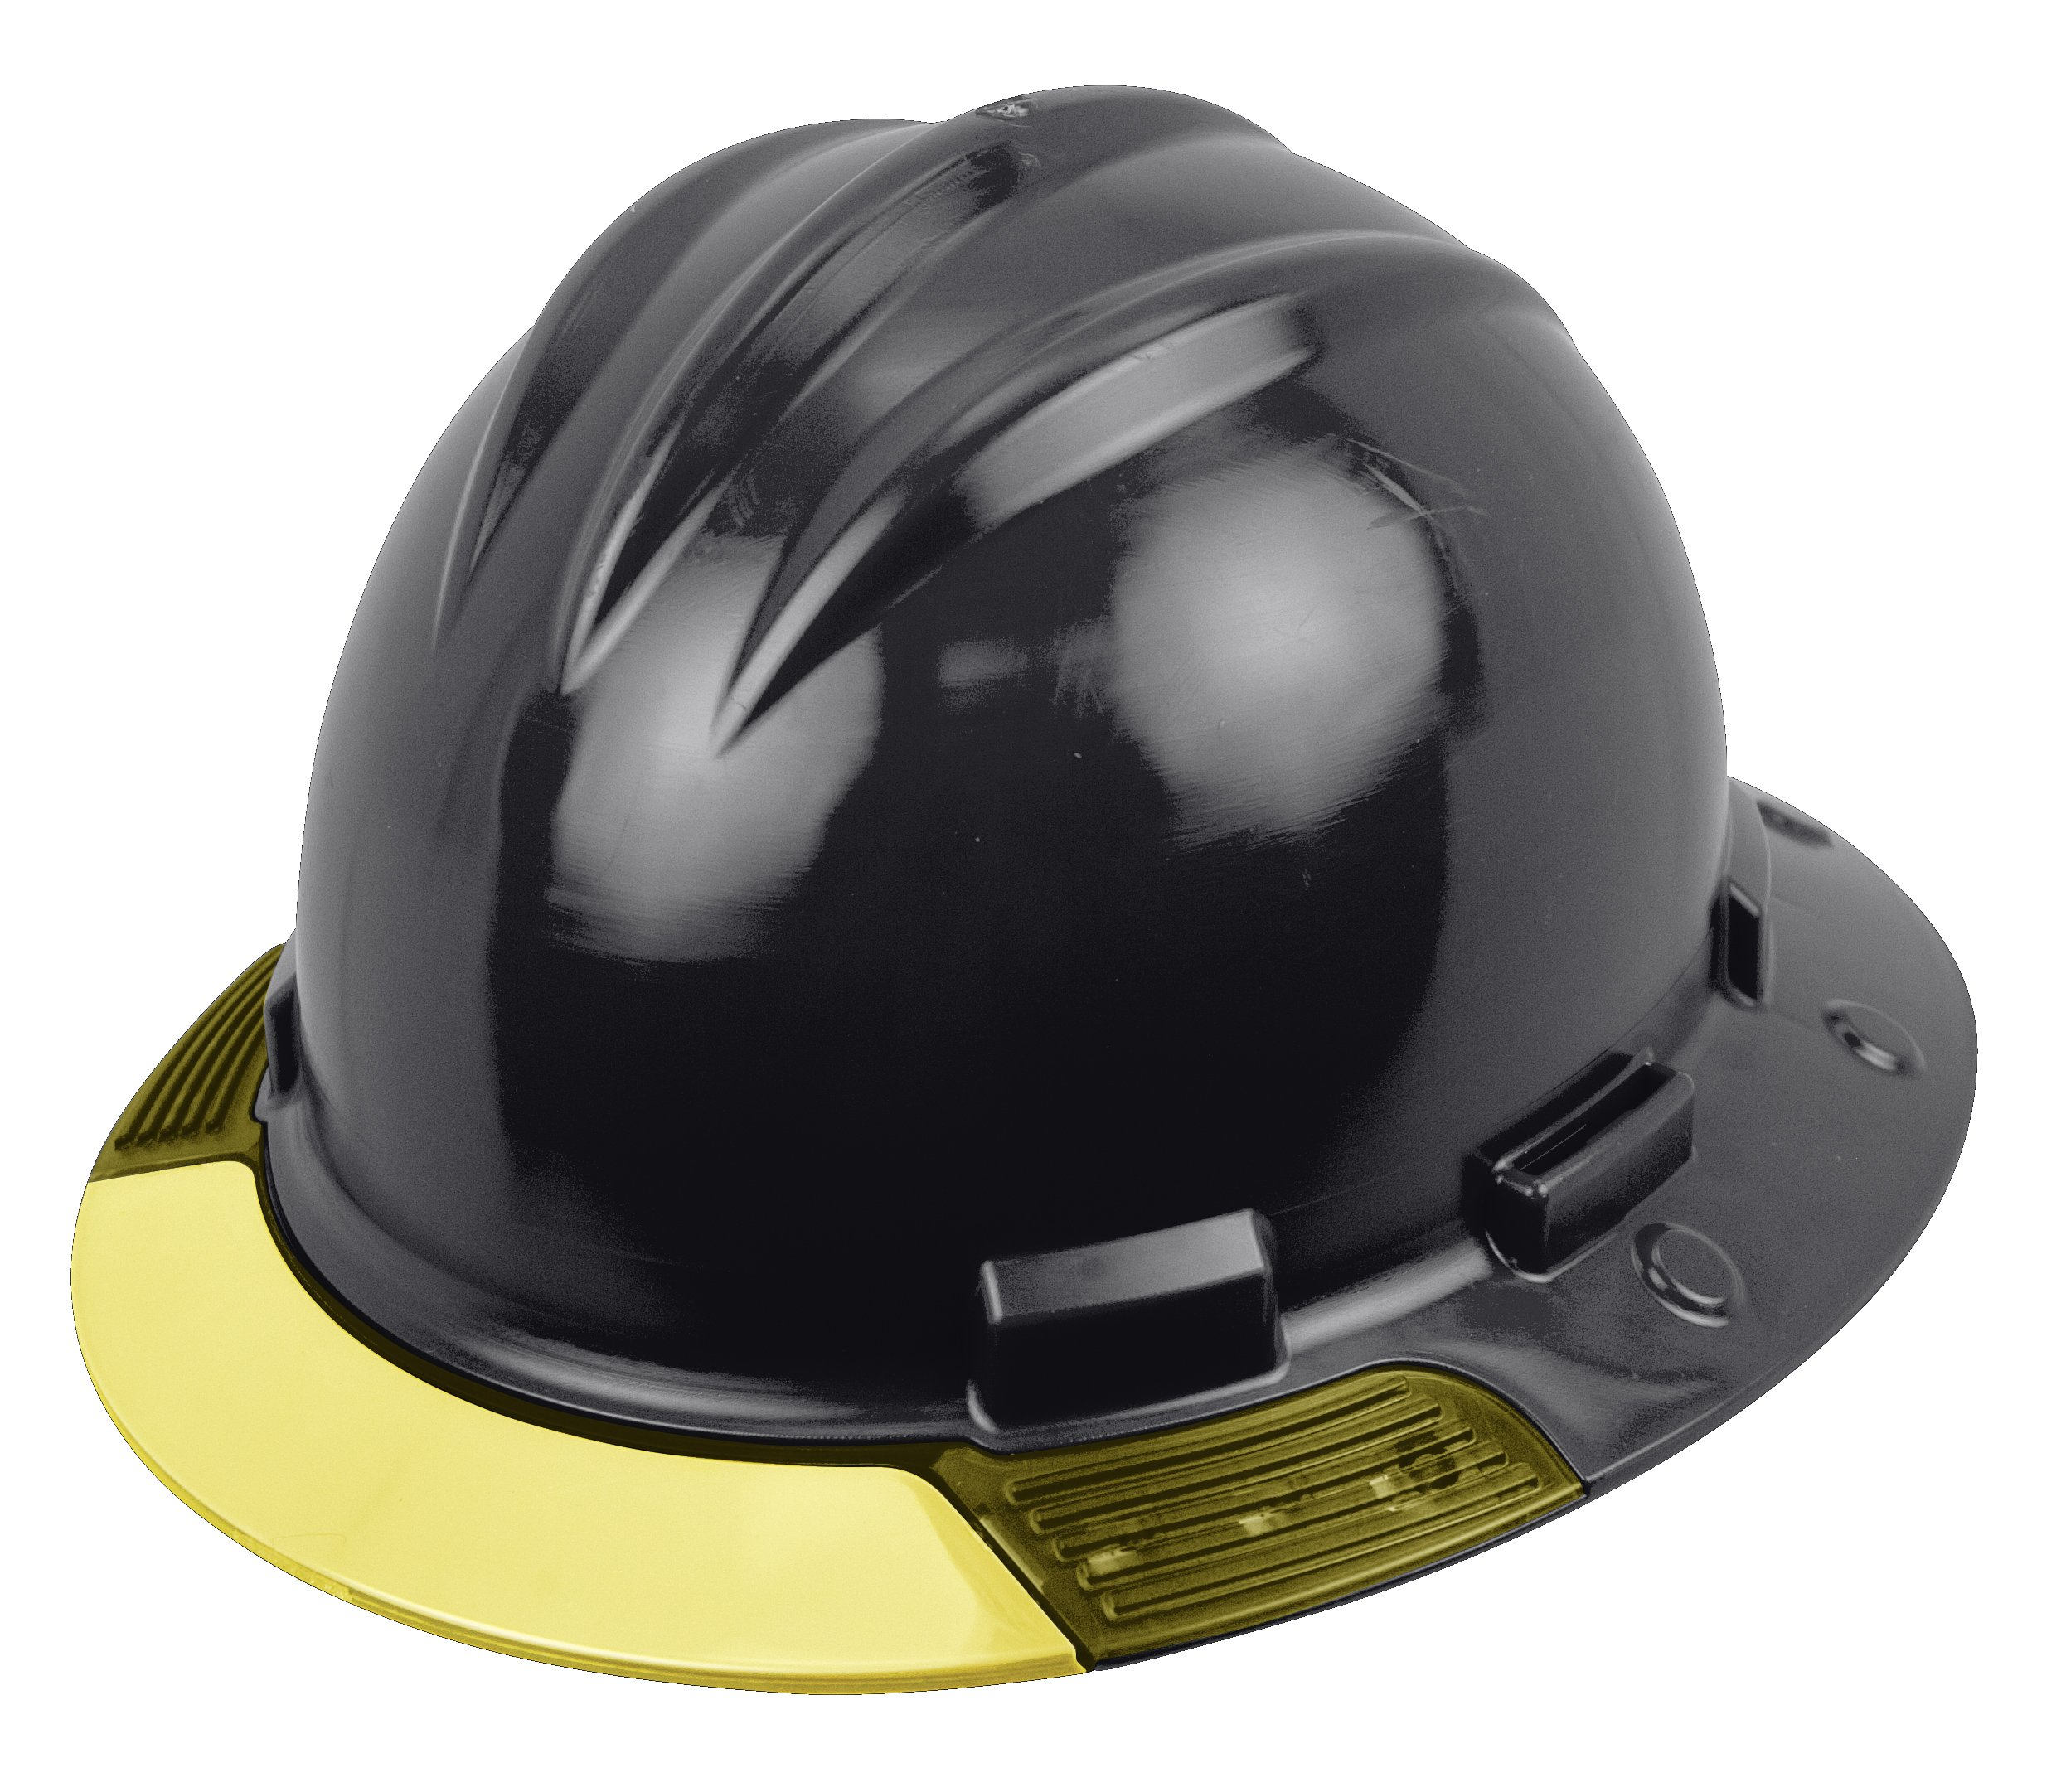 Bullard AVBKRY Above View Hard Hat, Black, Cotton Brow Pad, Ratchet Suspension, Yellow Visor, One Size